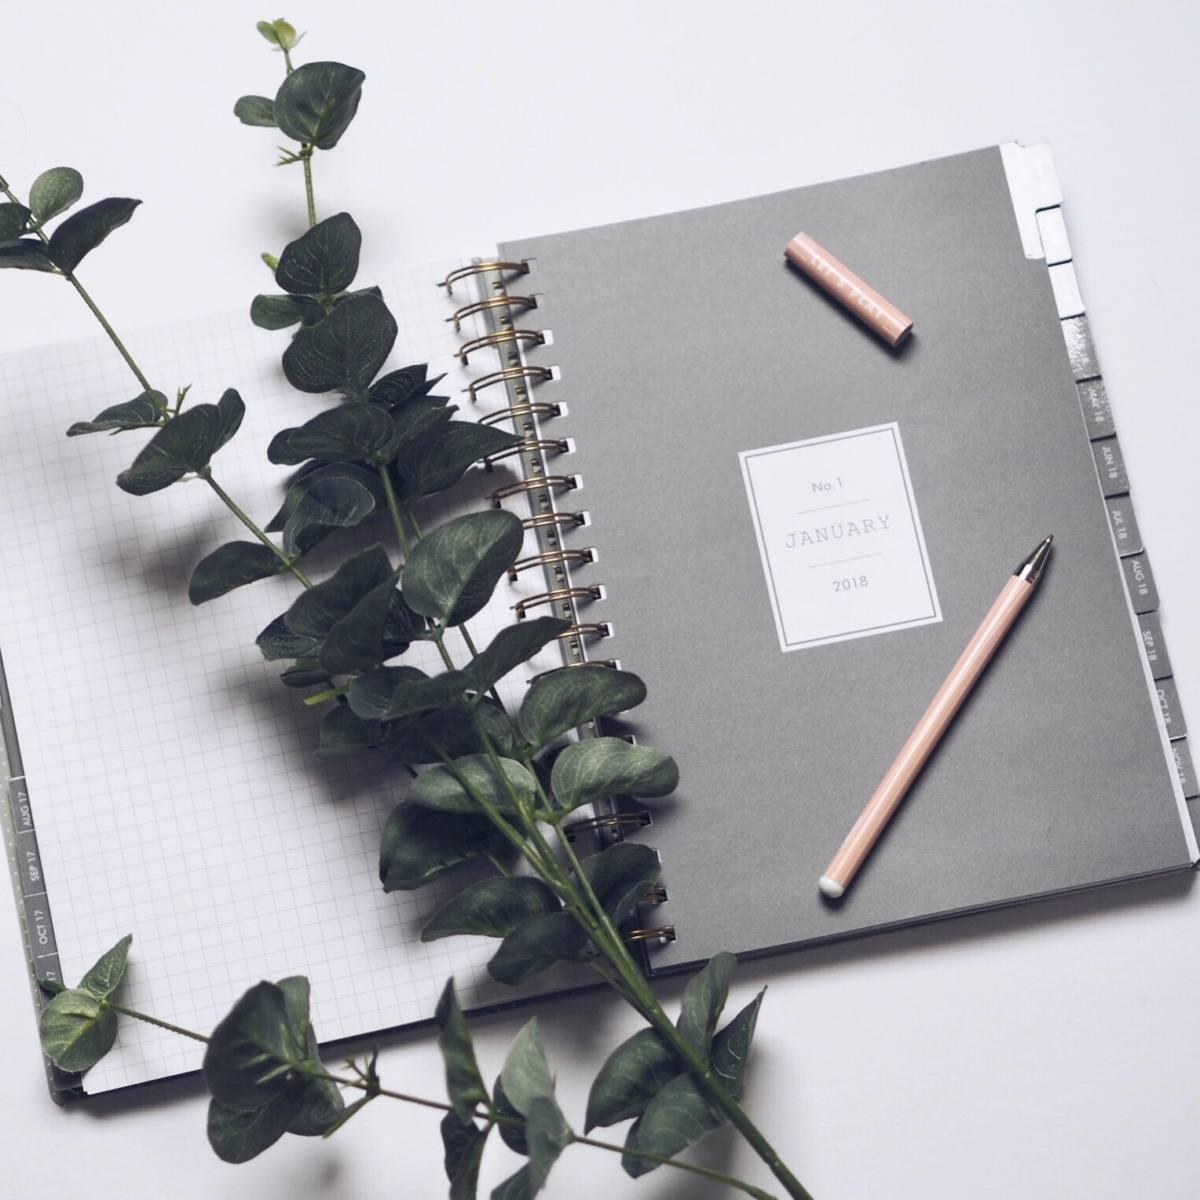 2018 blogging plans